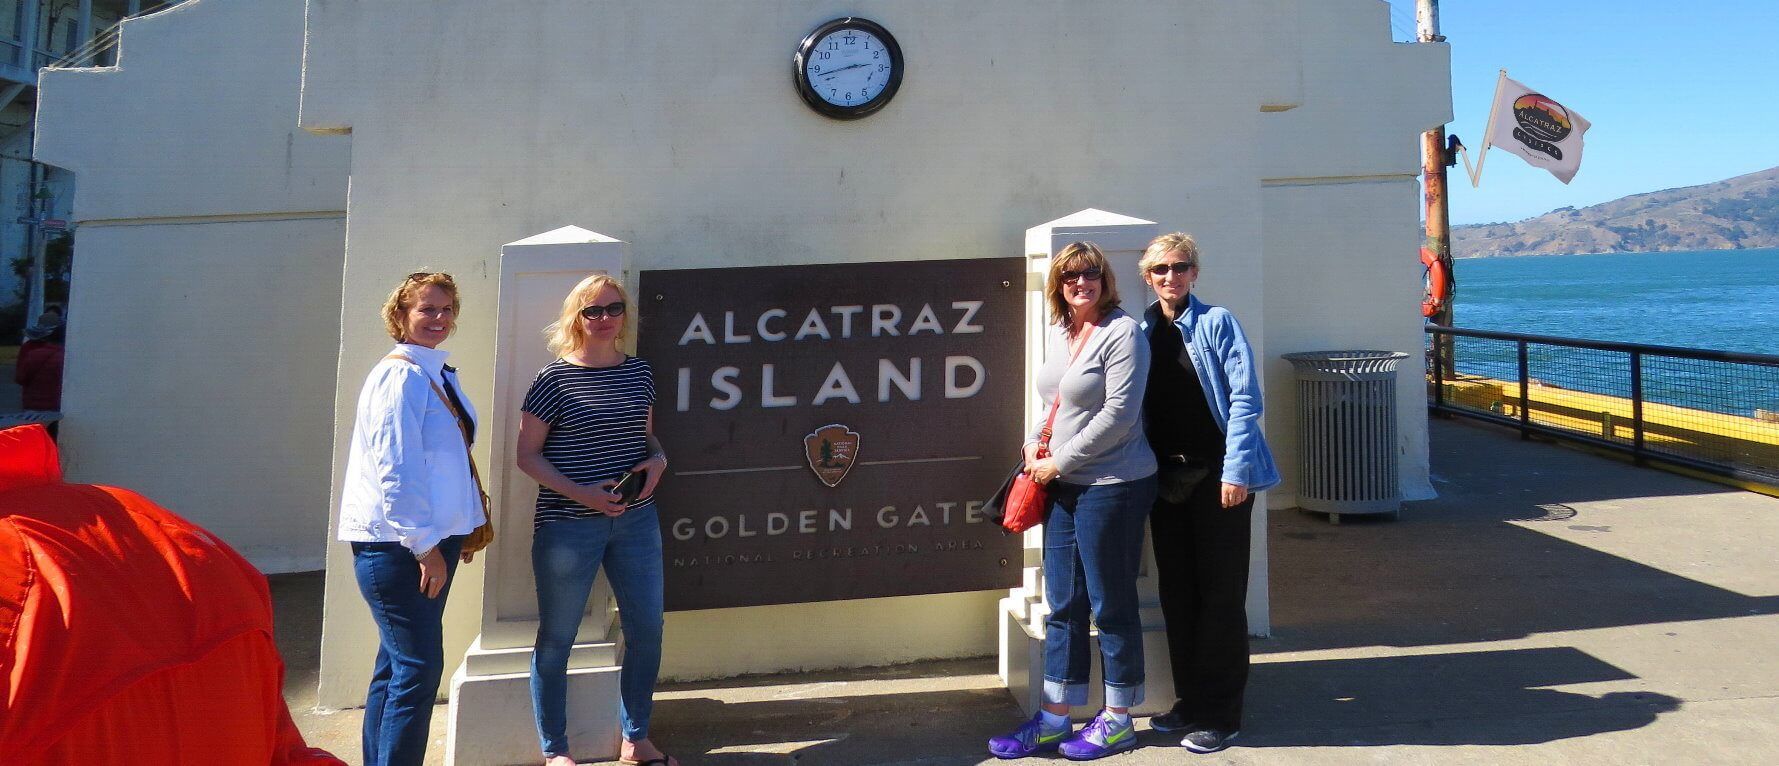 alcatraz-island-prison-tickets-jail-sail-ferry-sf-bay